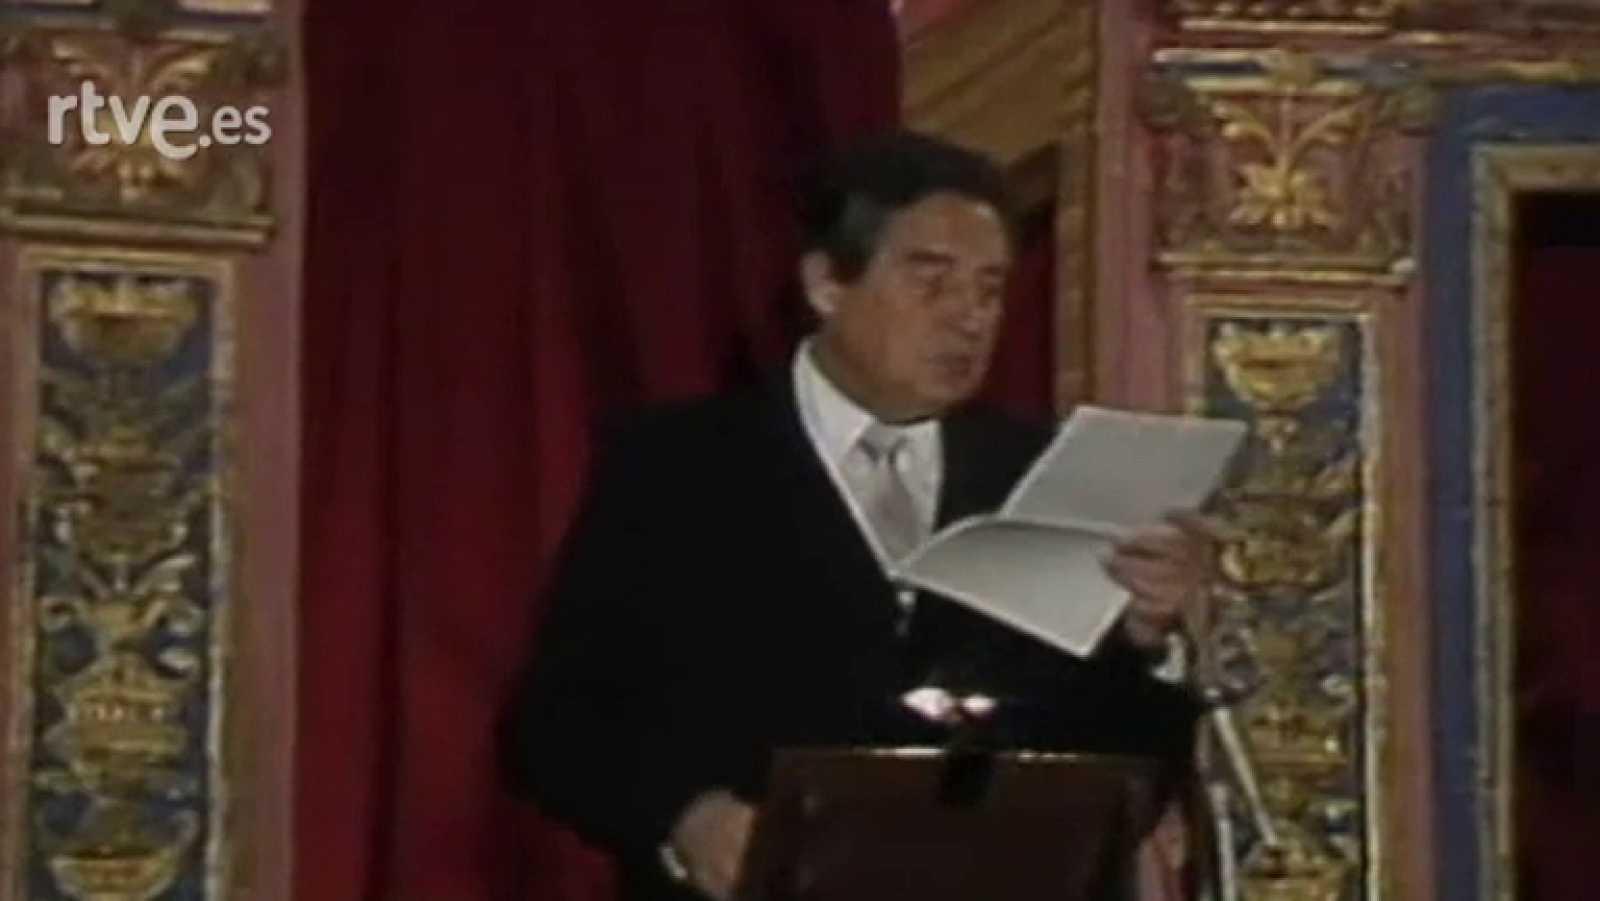 Discurso Octavio Paz, Premio Cervantes 1981